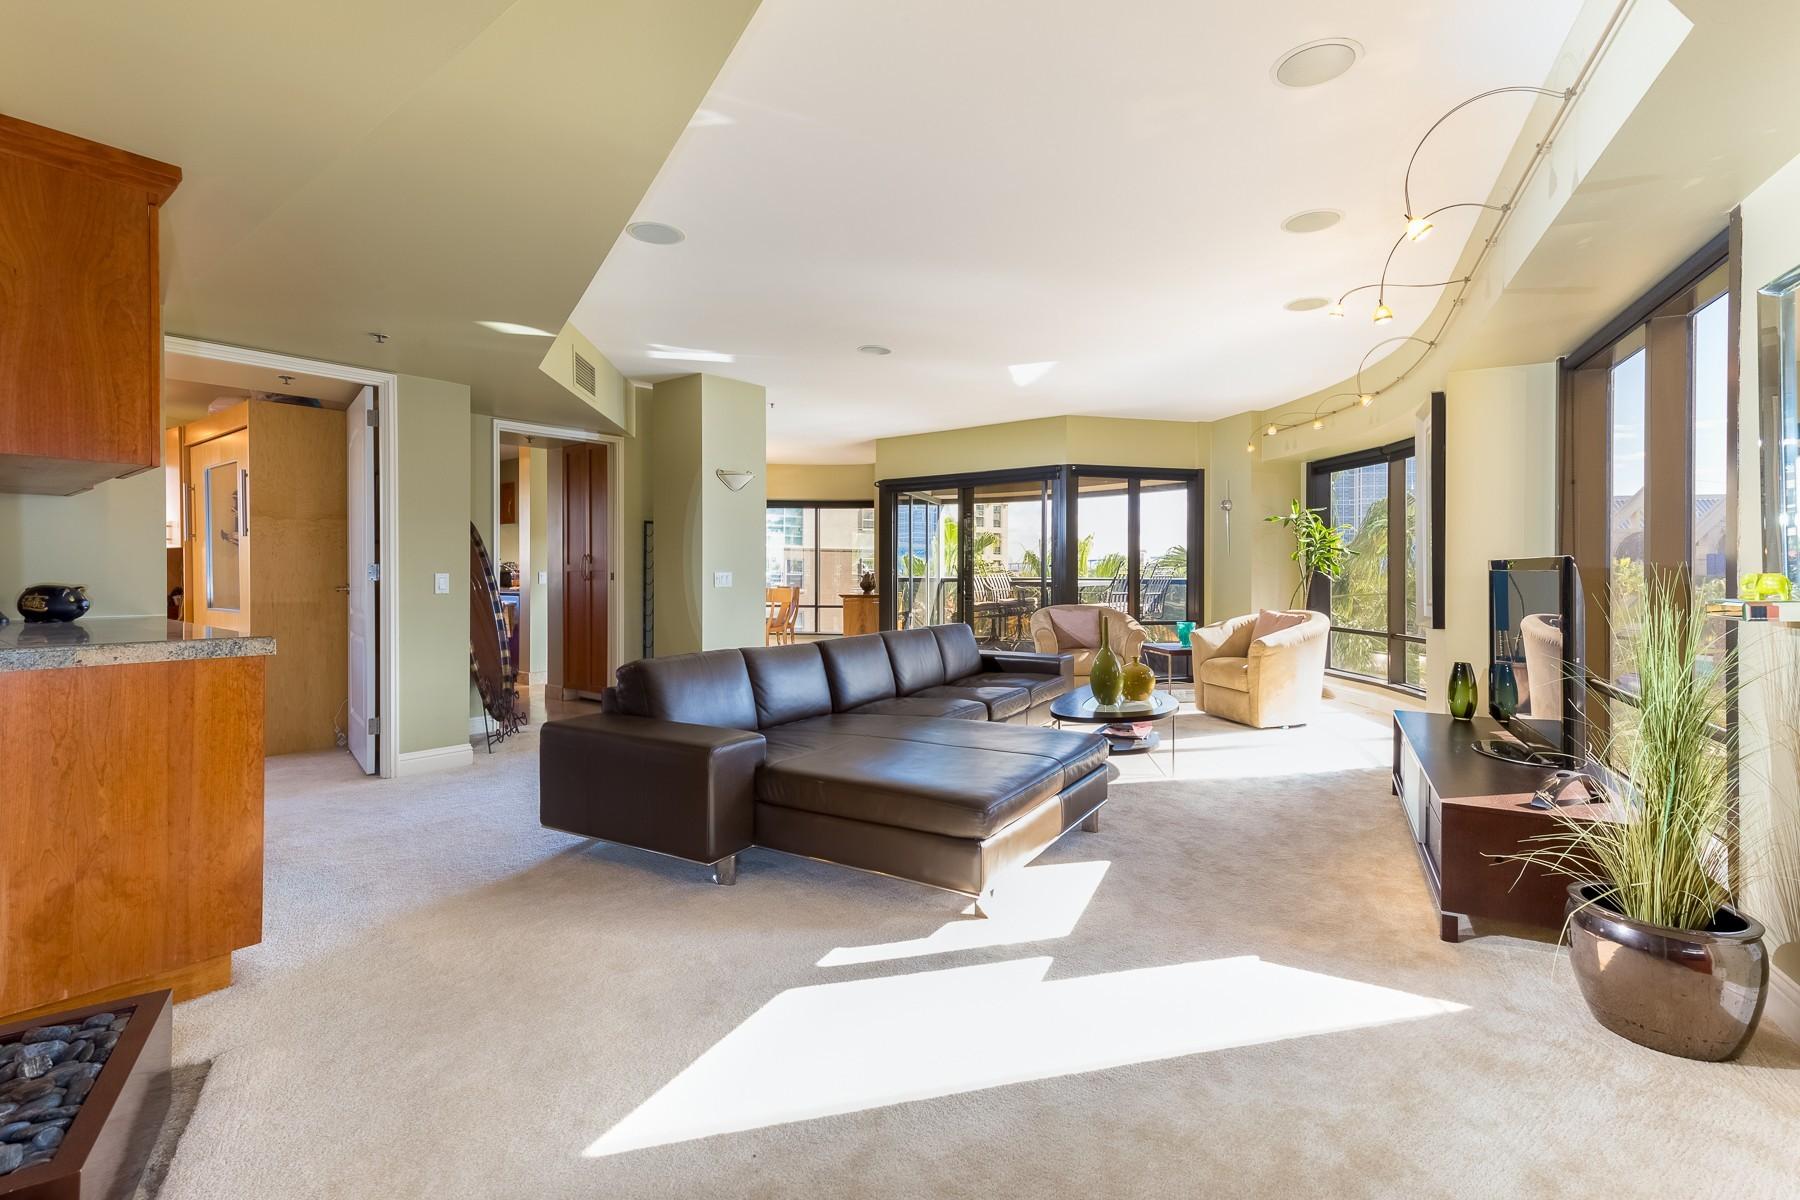 Housing Rentals San Diego  Bed Rooms